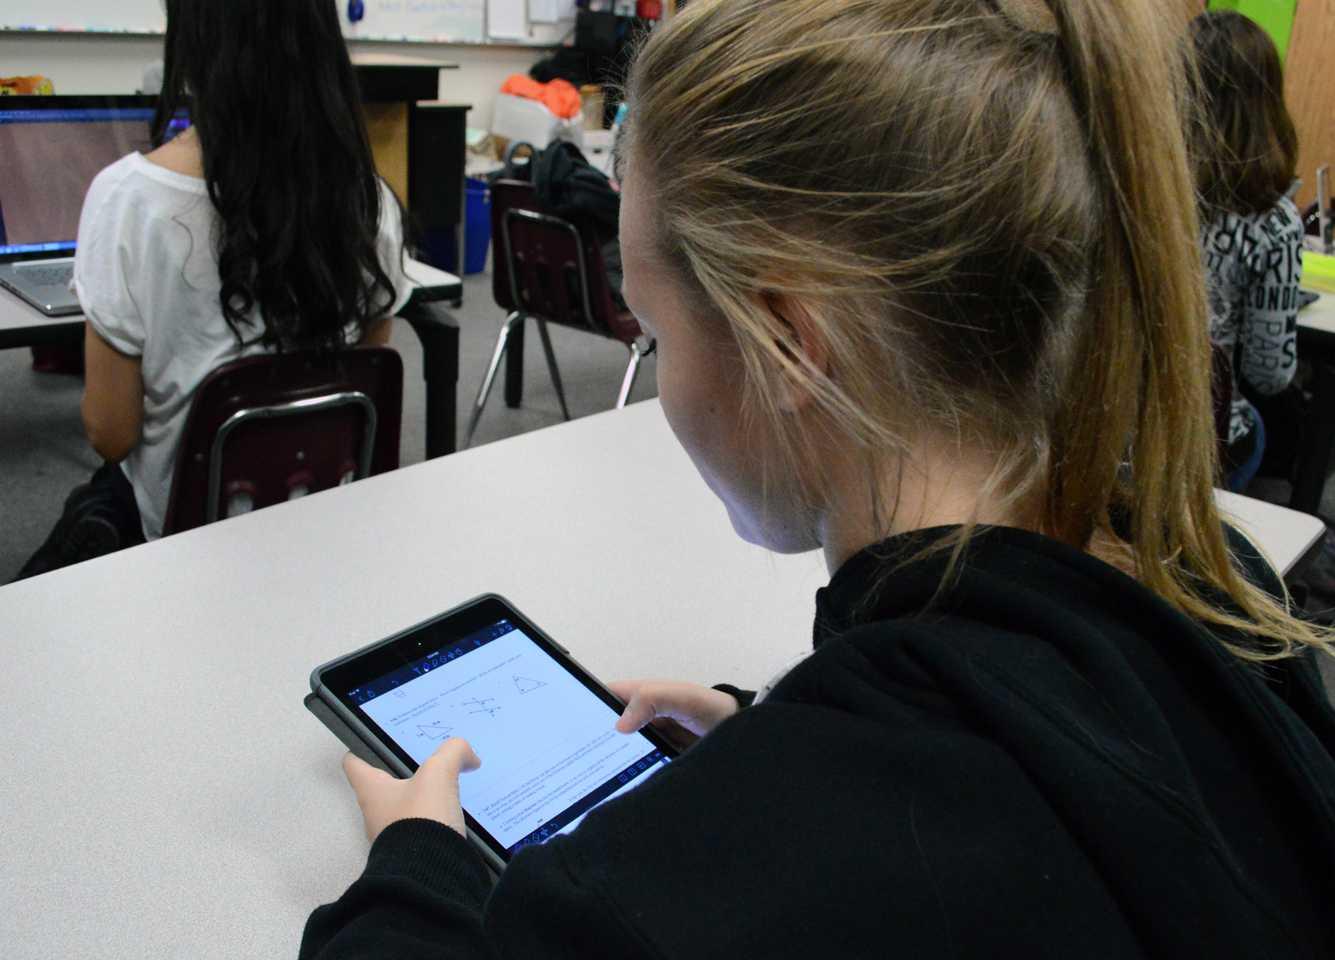 Freshman Cheyenne Voorhies works diligently on her iPad.